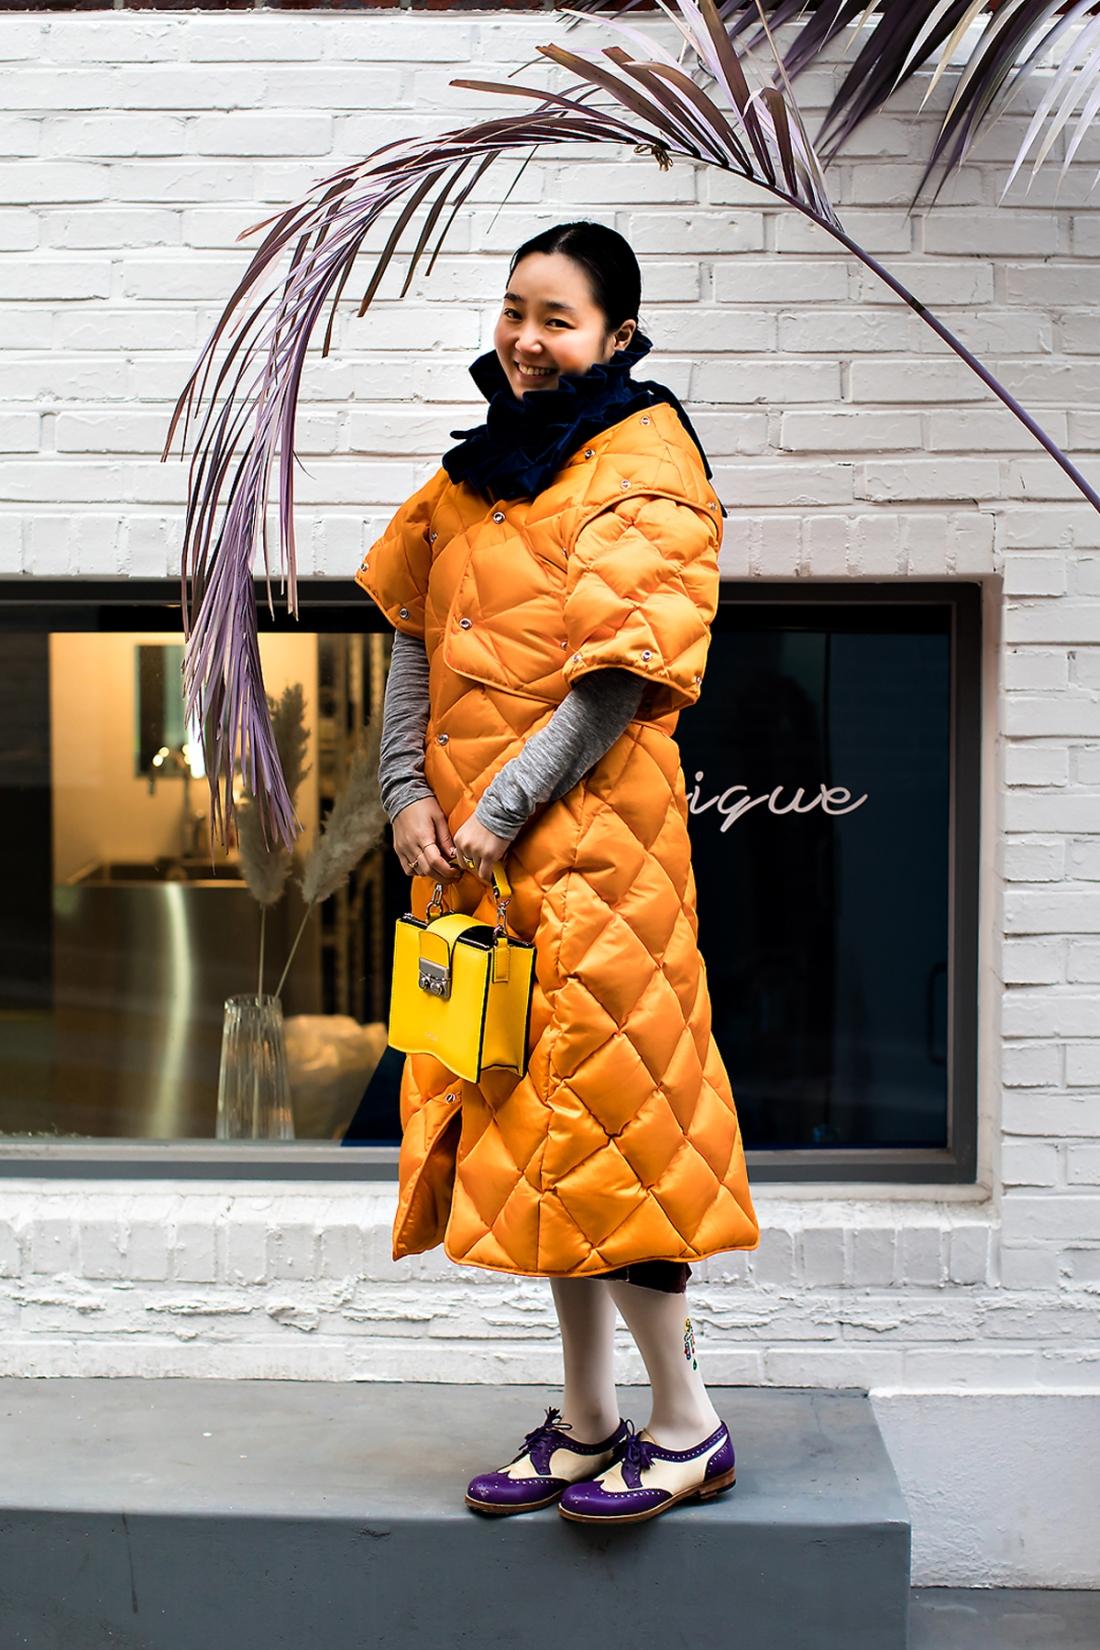 choi-hyewon-street-fashion-2017-in-seoul